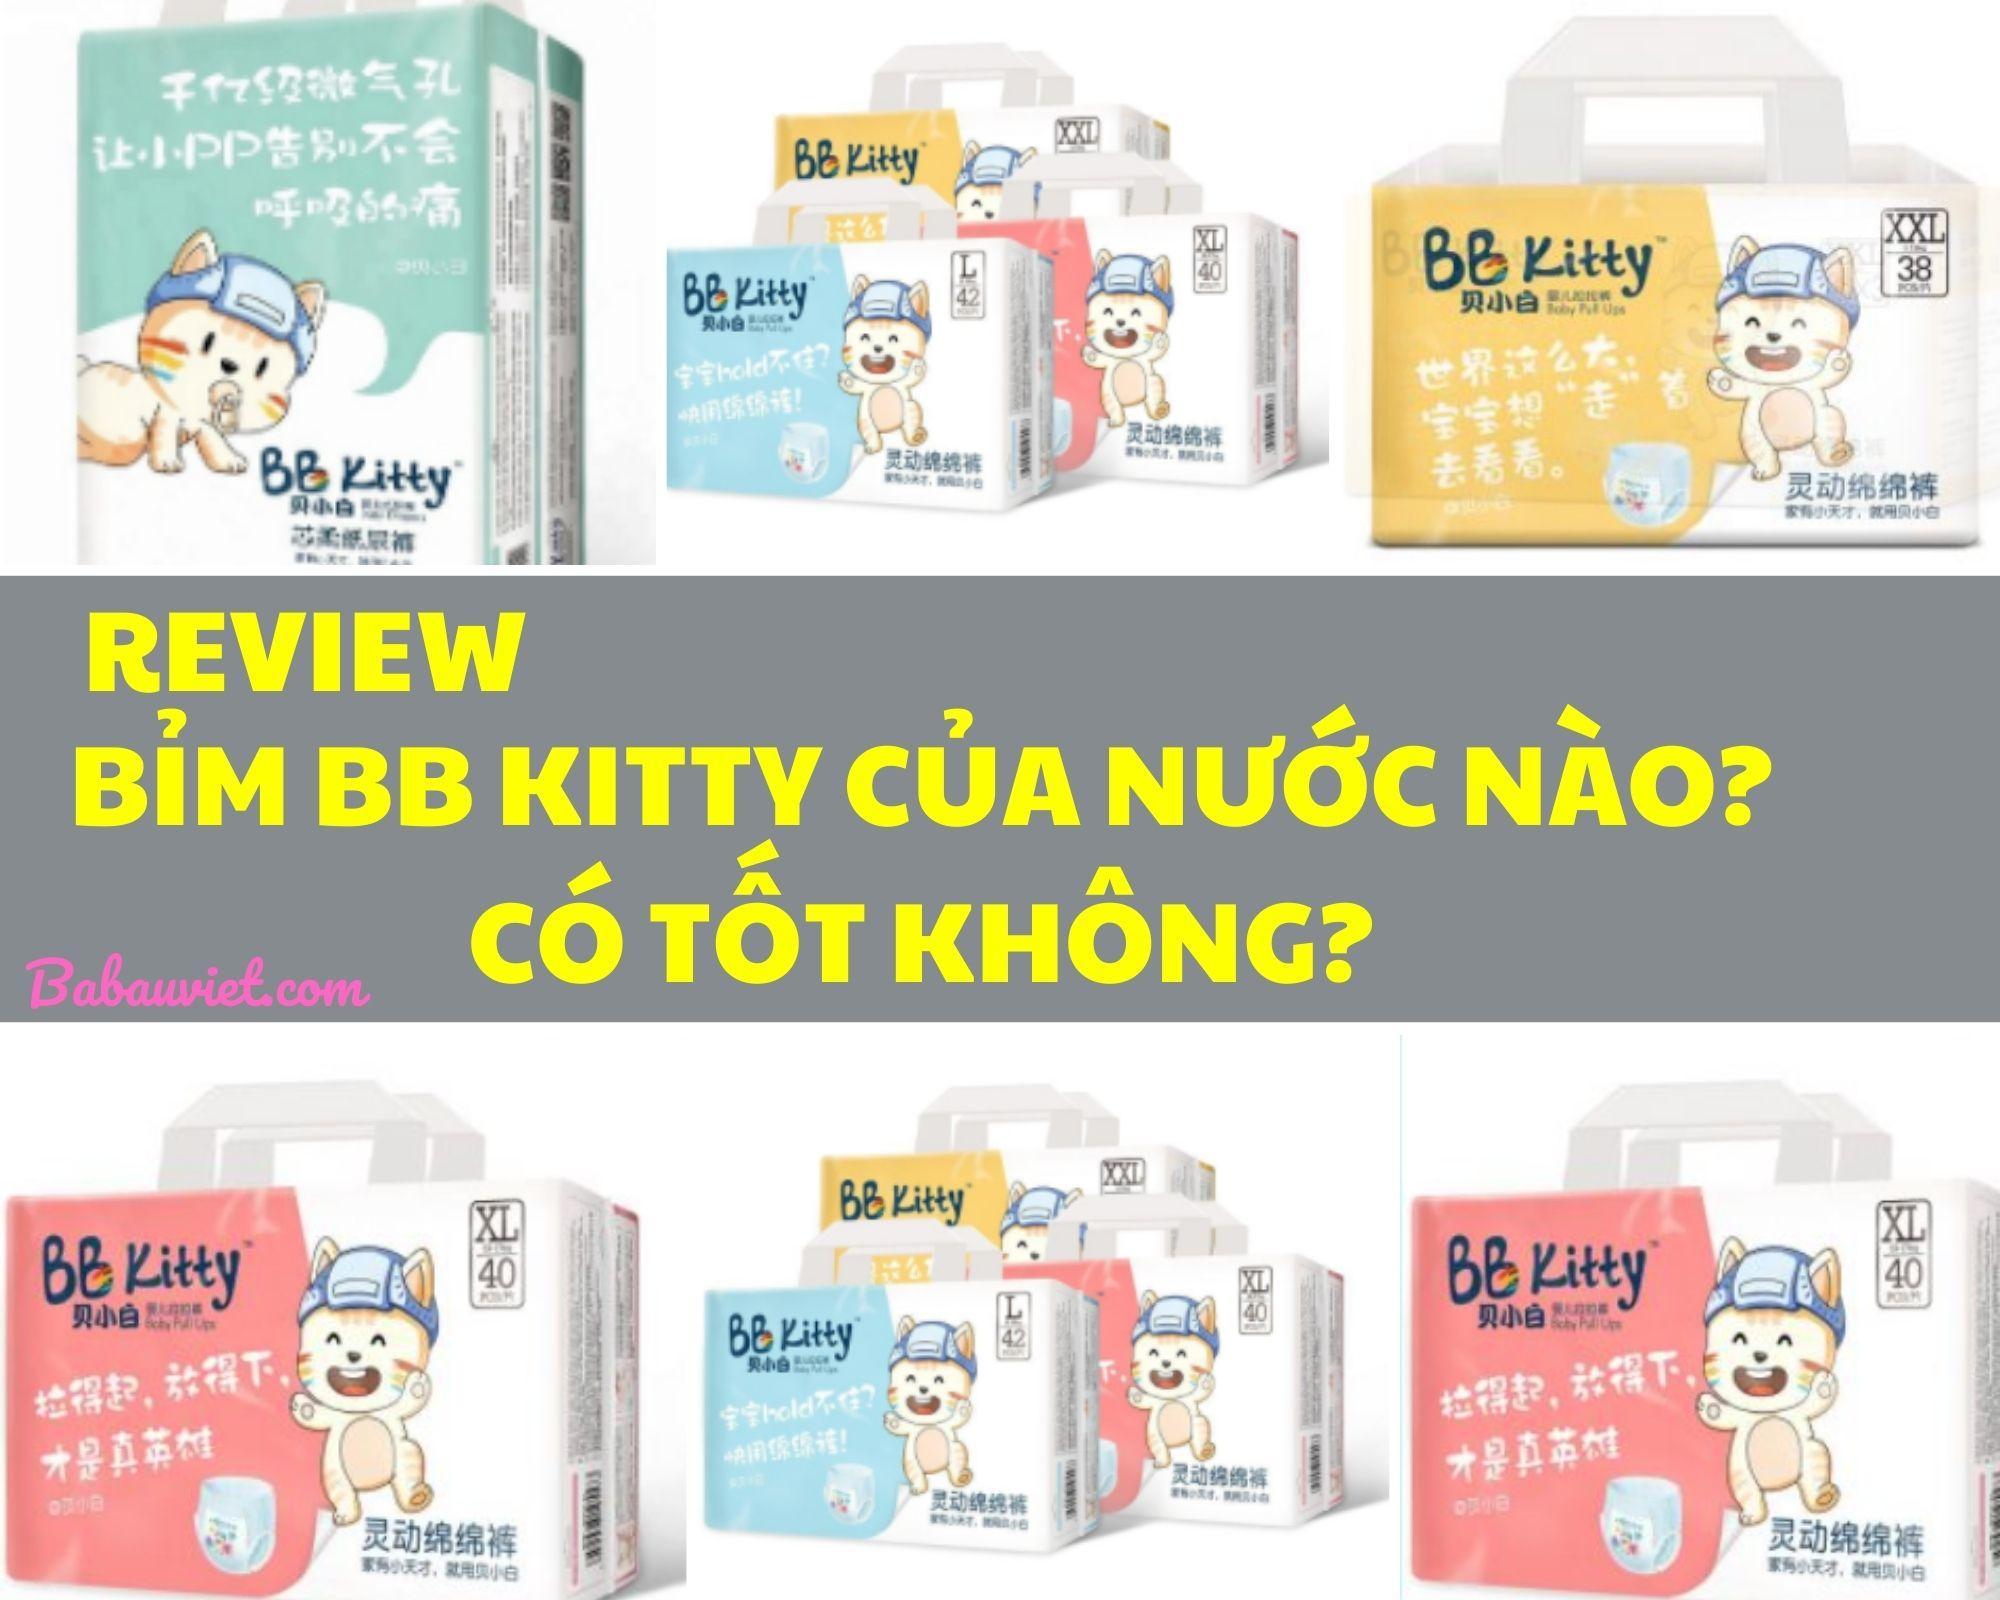 REVIEW BIM BB KITTY CUA NUOC NAO CO TOT KHONG